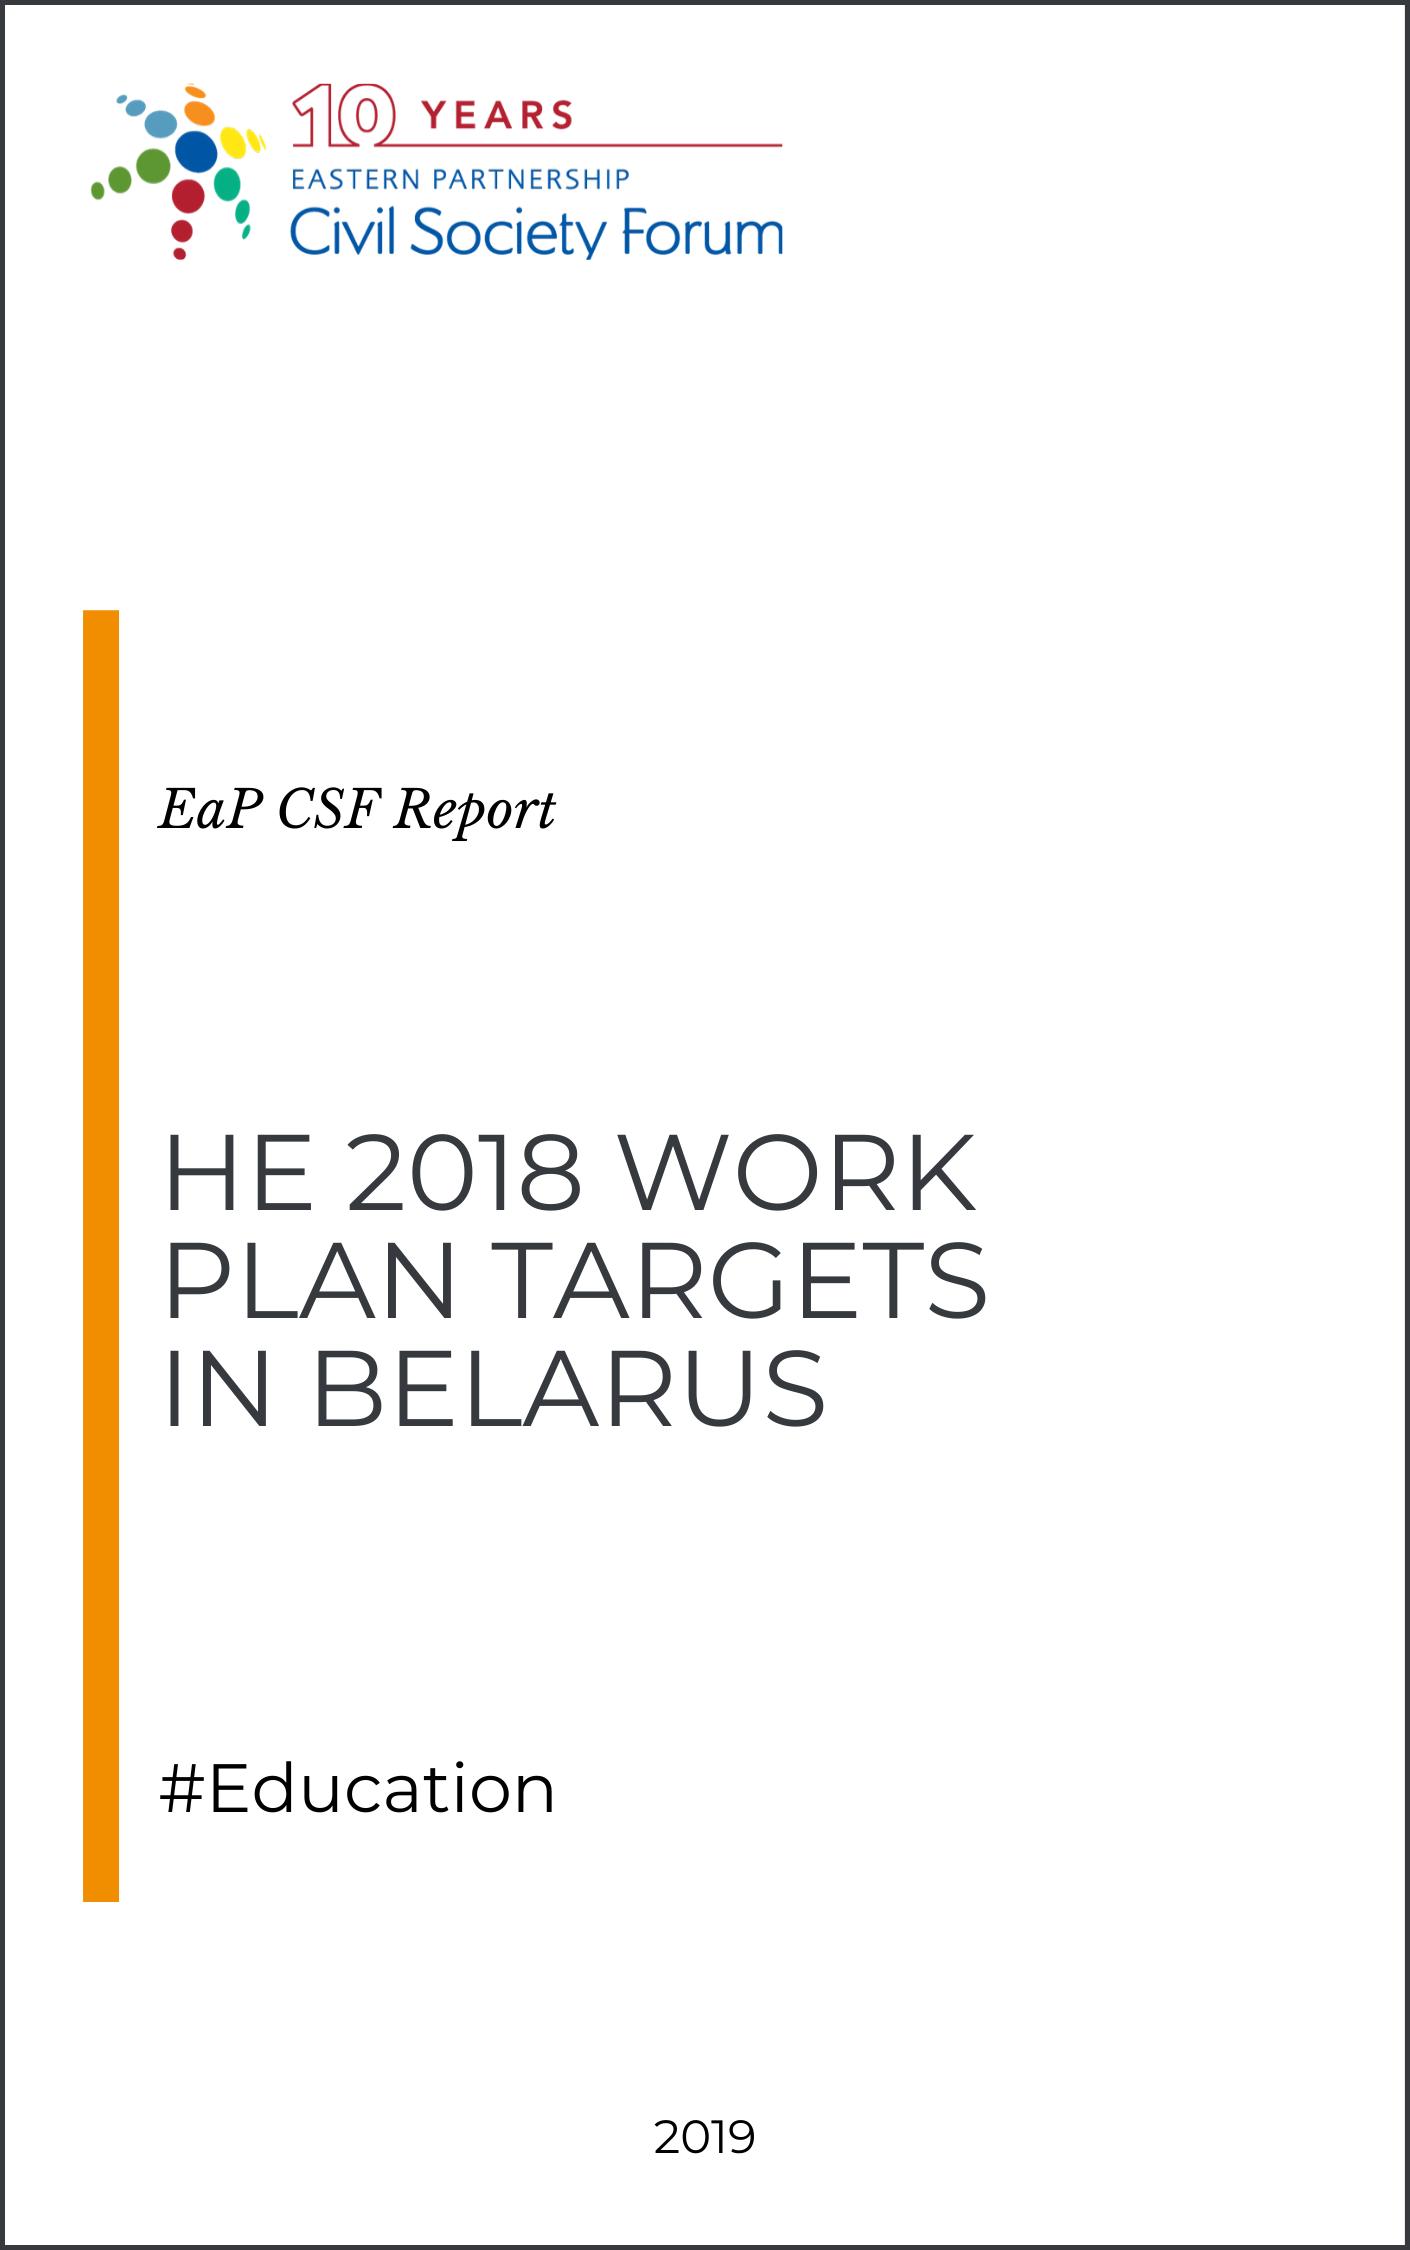 HE 2018 Work Plan Targets in Belarus